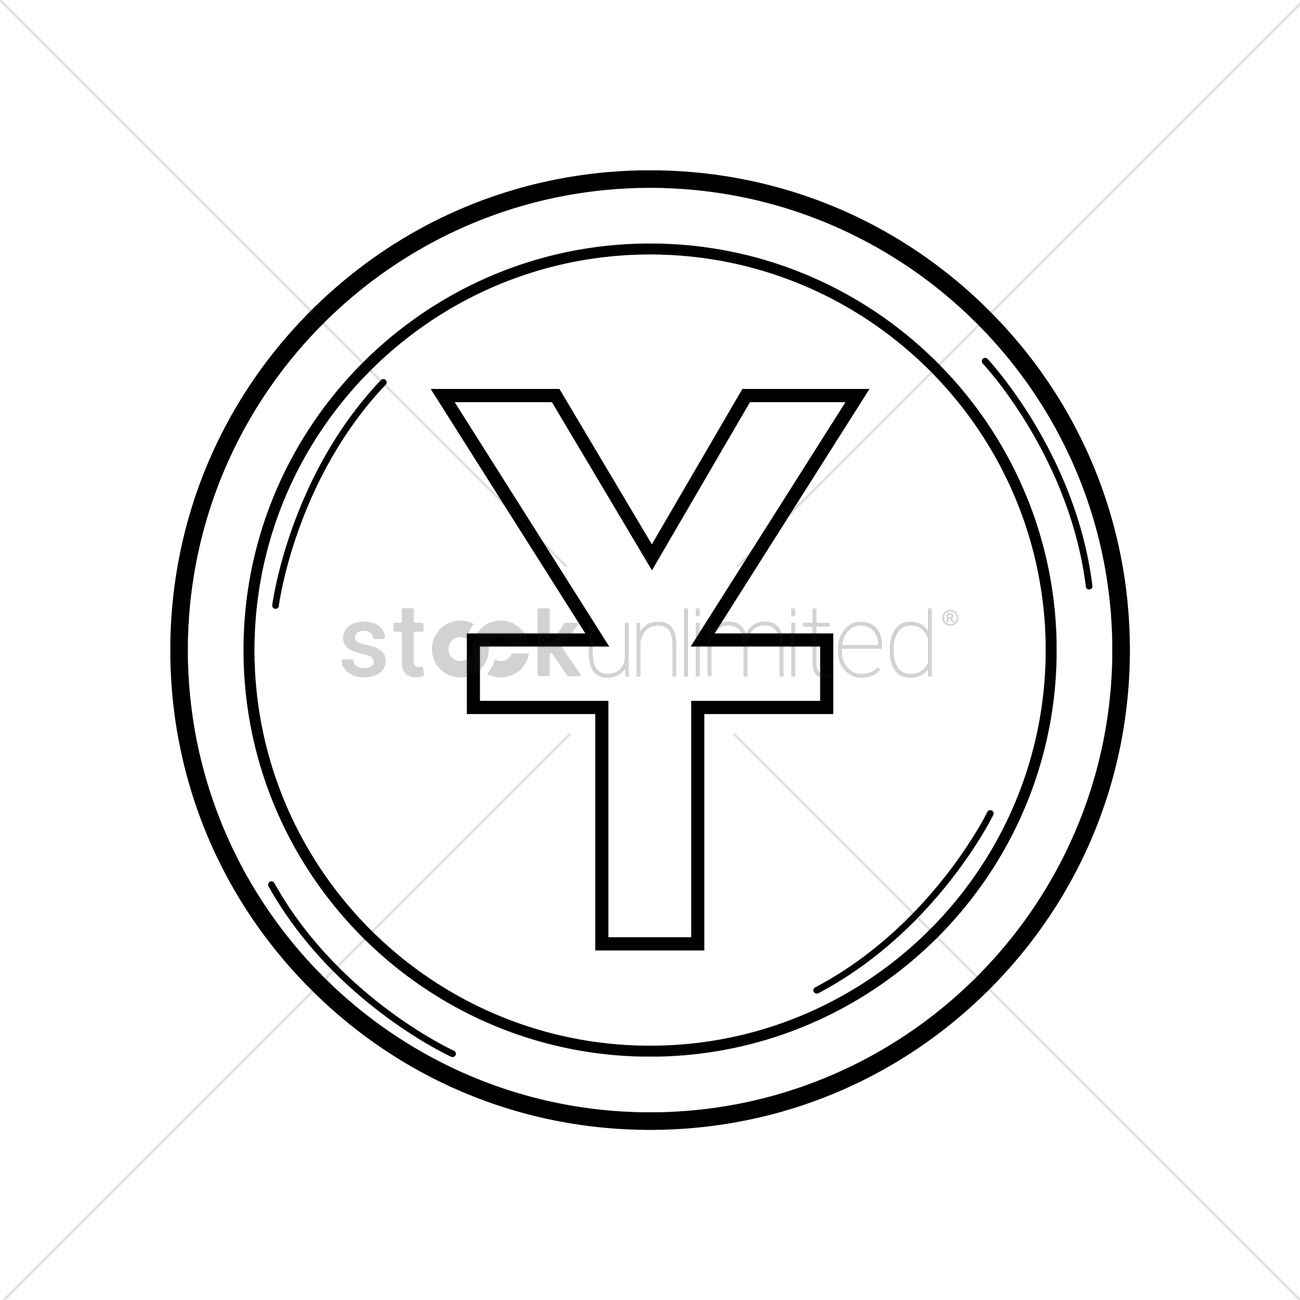 Yuan currency symbol vector image 1575977 stockunlimited yuan currency symbol vector graphic biocorpaavc